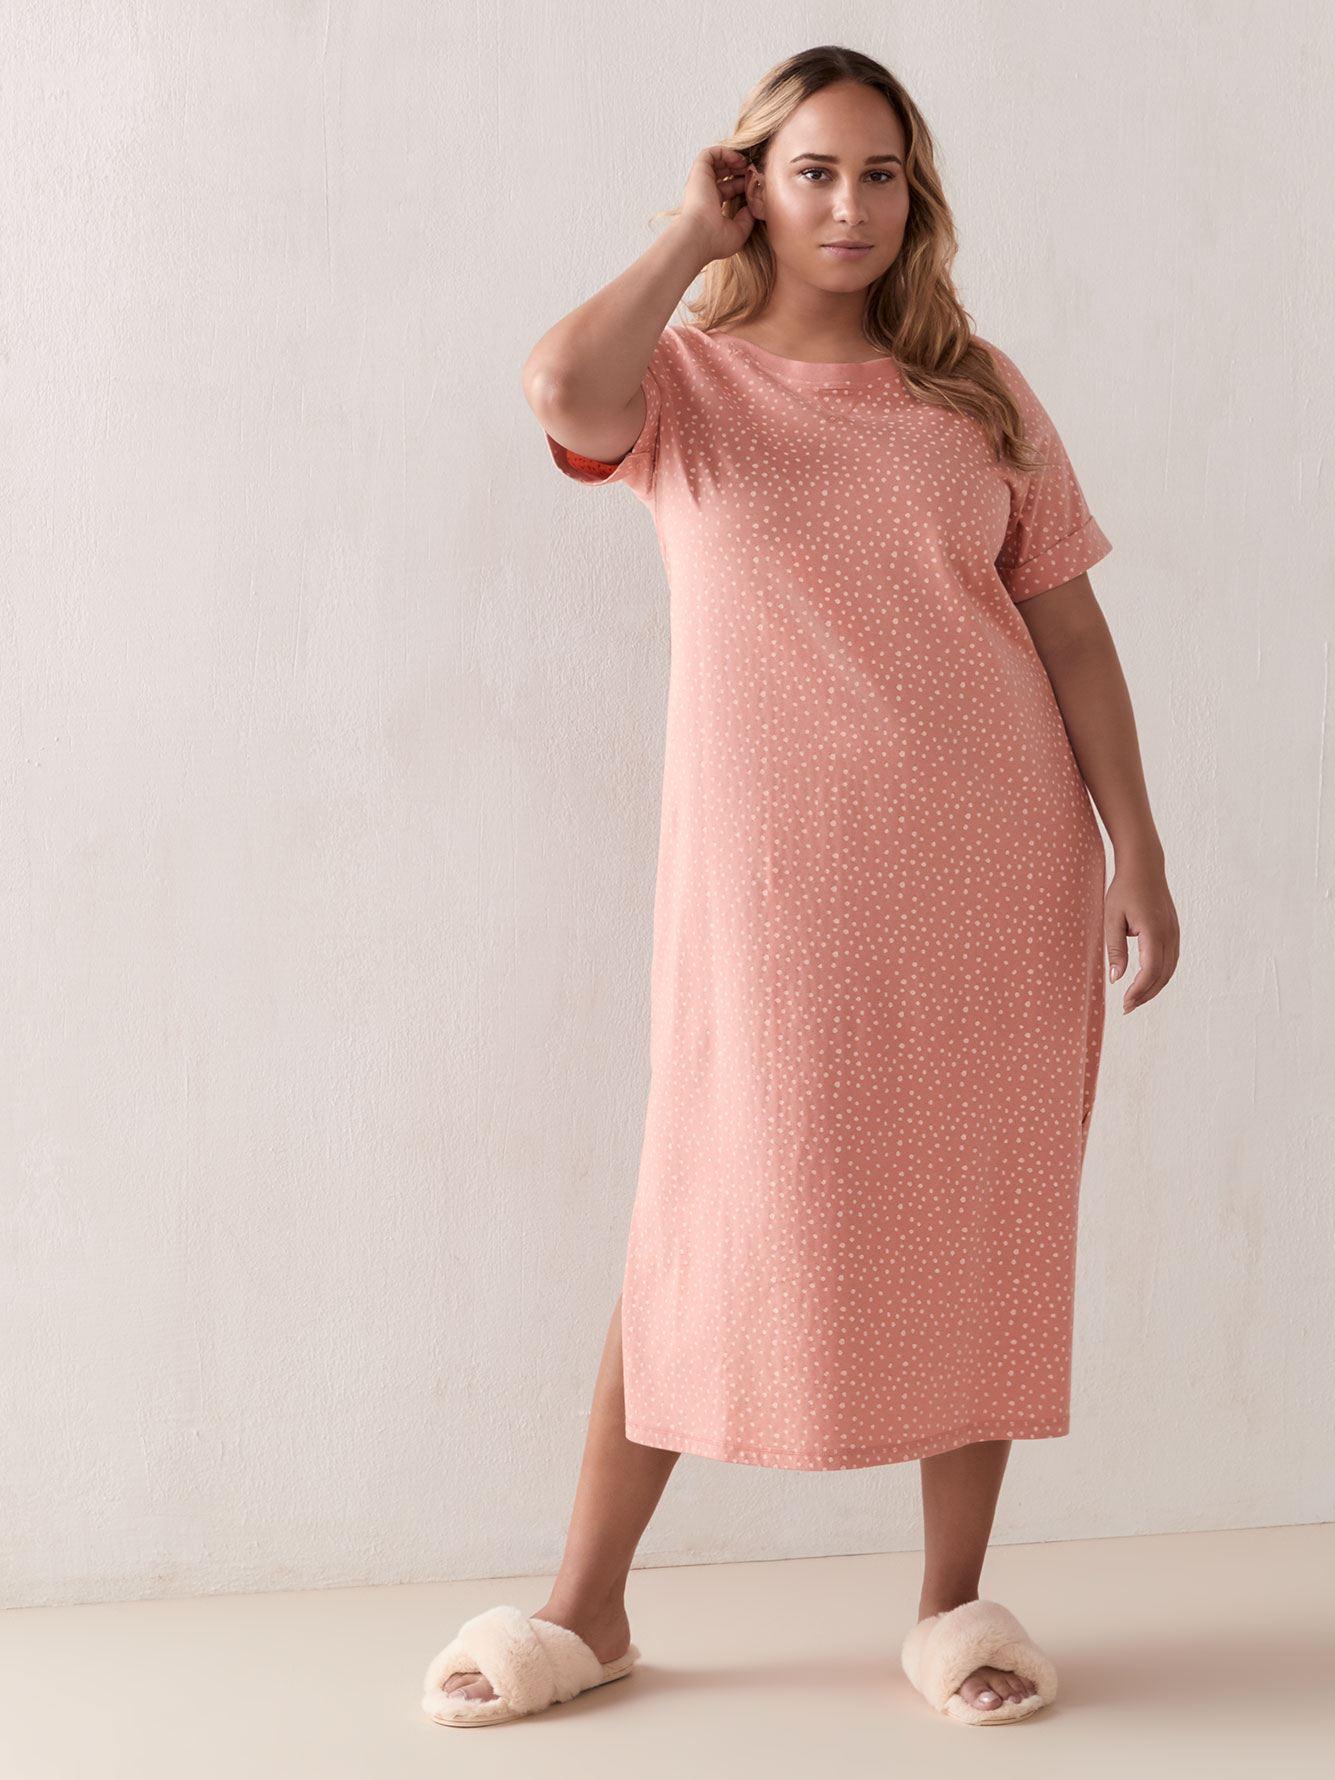 Printed Short Sleeve Sleepshirt - Addition Elle